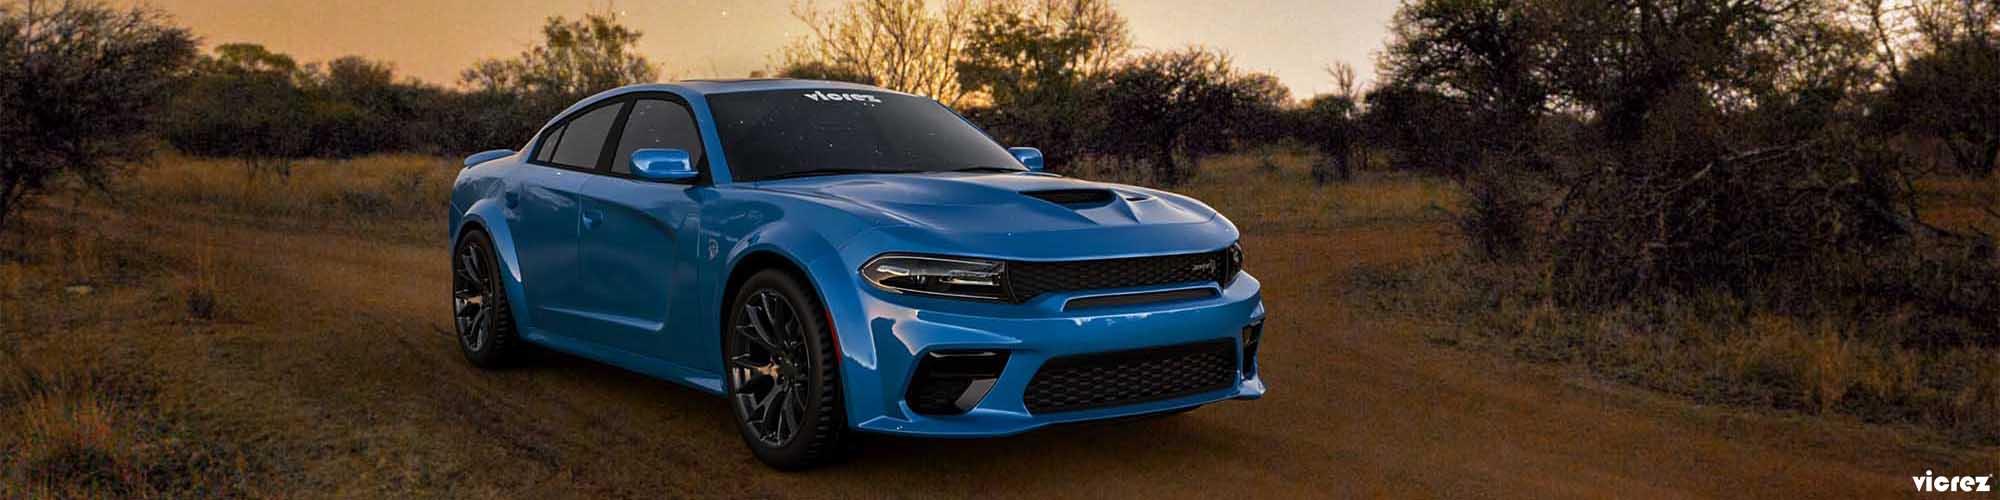 Vicrez V3R Style Rear Diffuser vz102166 | Dodge Charger Widebody 2020-2021